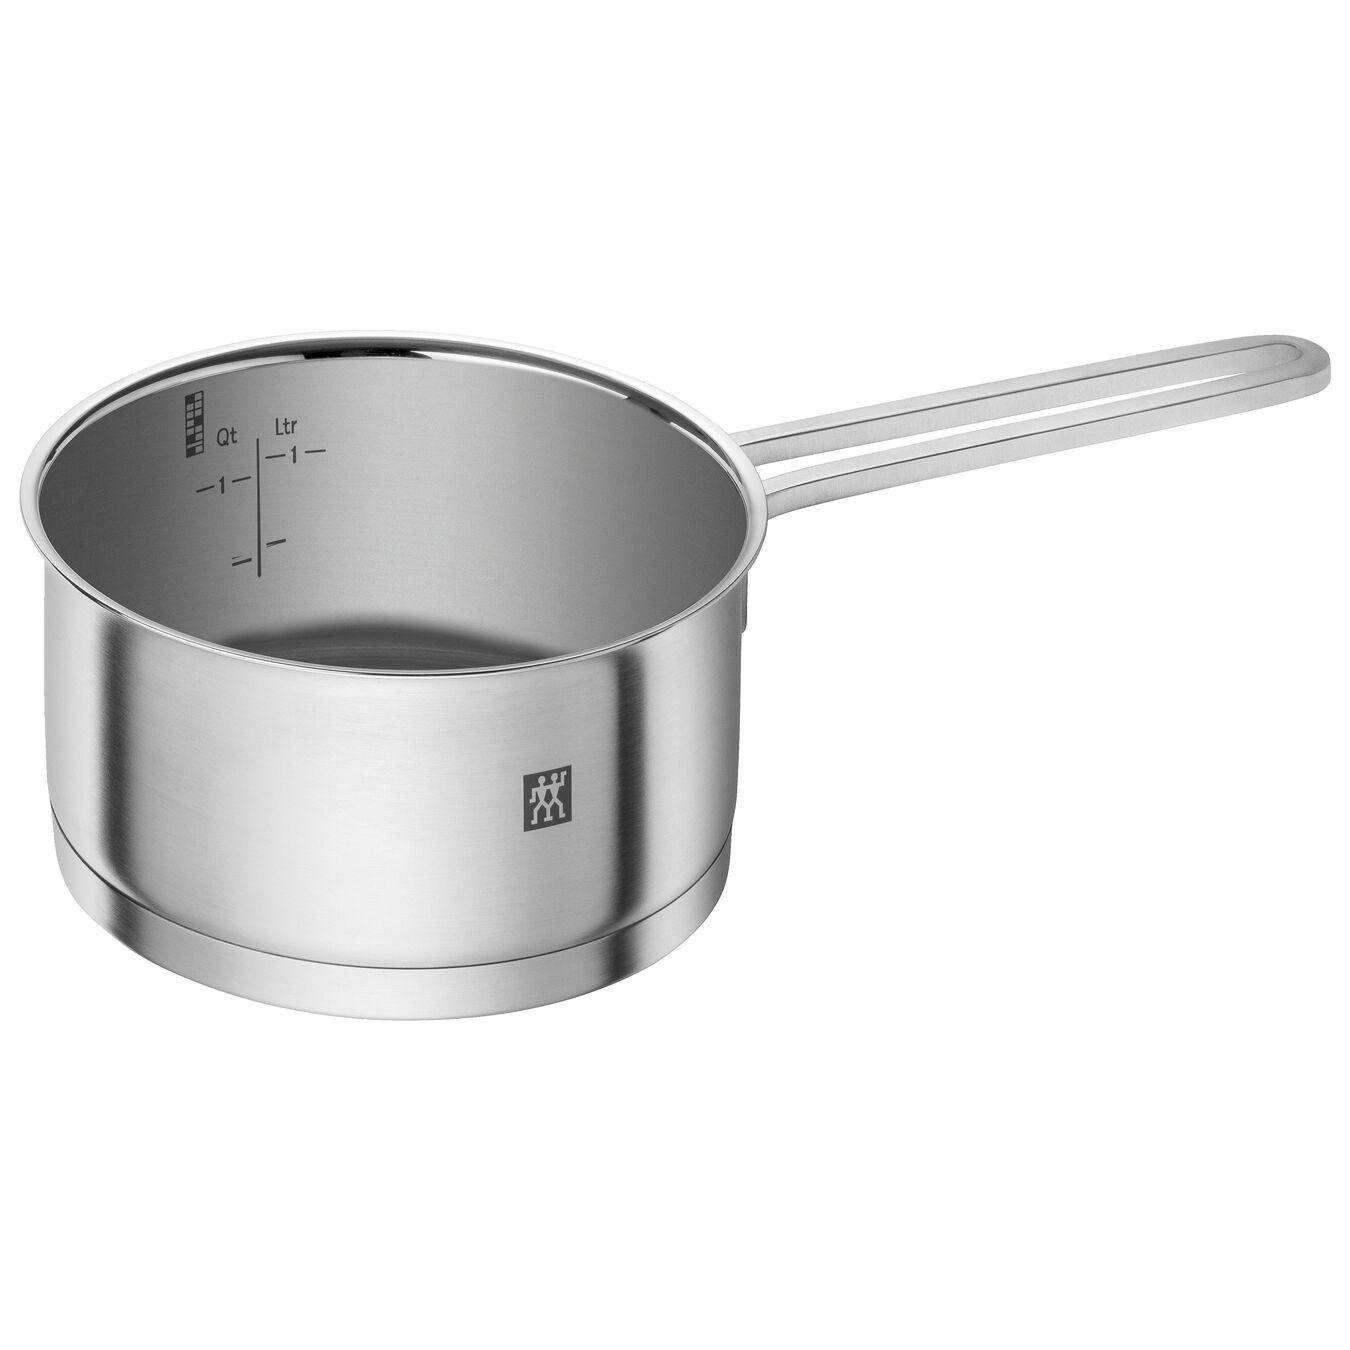 Stieltopf ohne Deckel 16 cm, 18/10 Edelstahl, Silber,,large 1